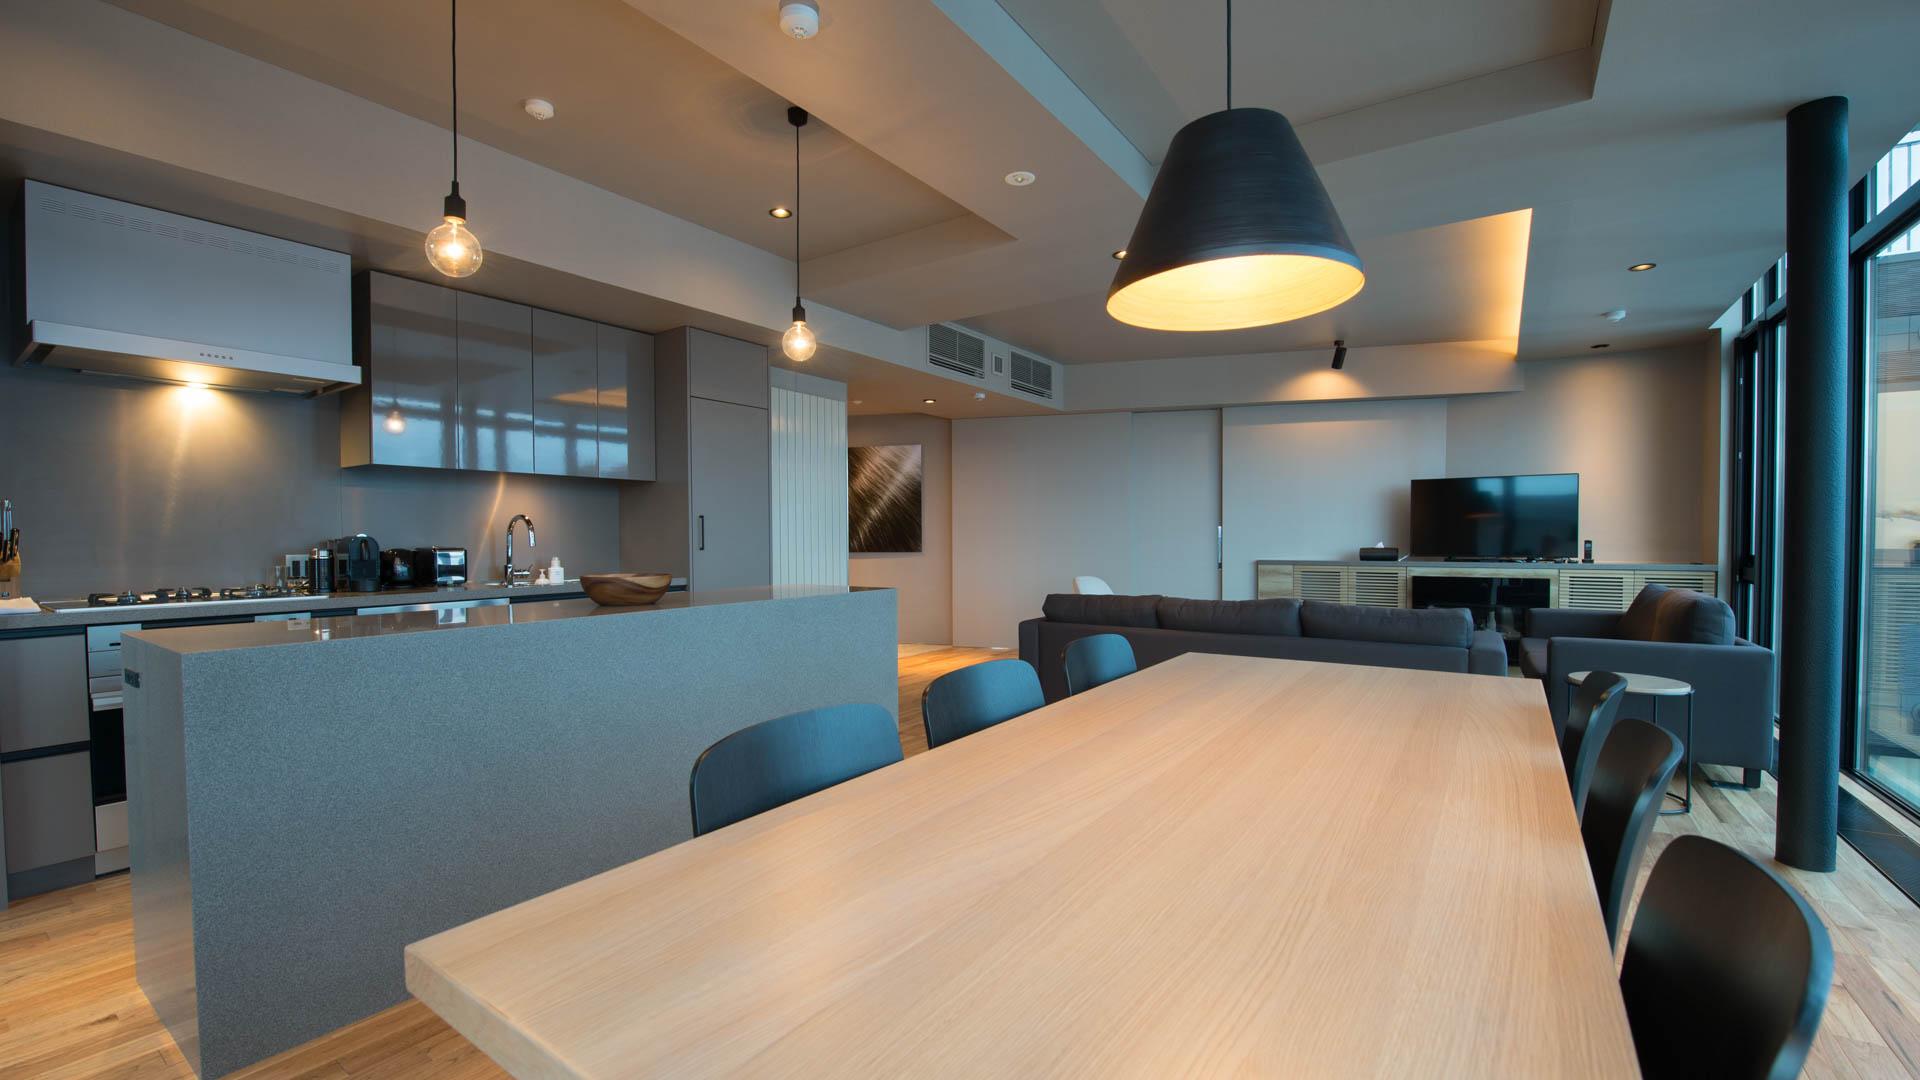 aspect-kodachi-dining-room_32696030865_o